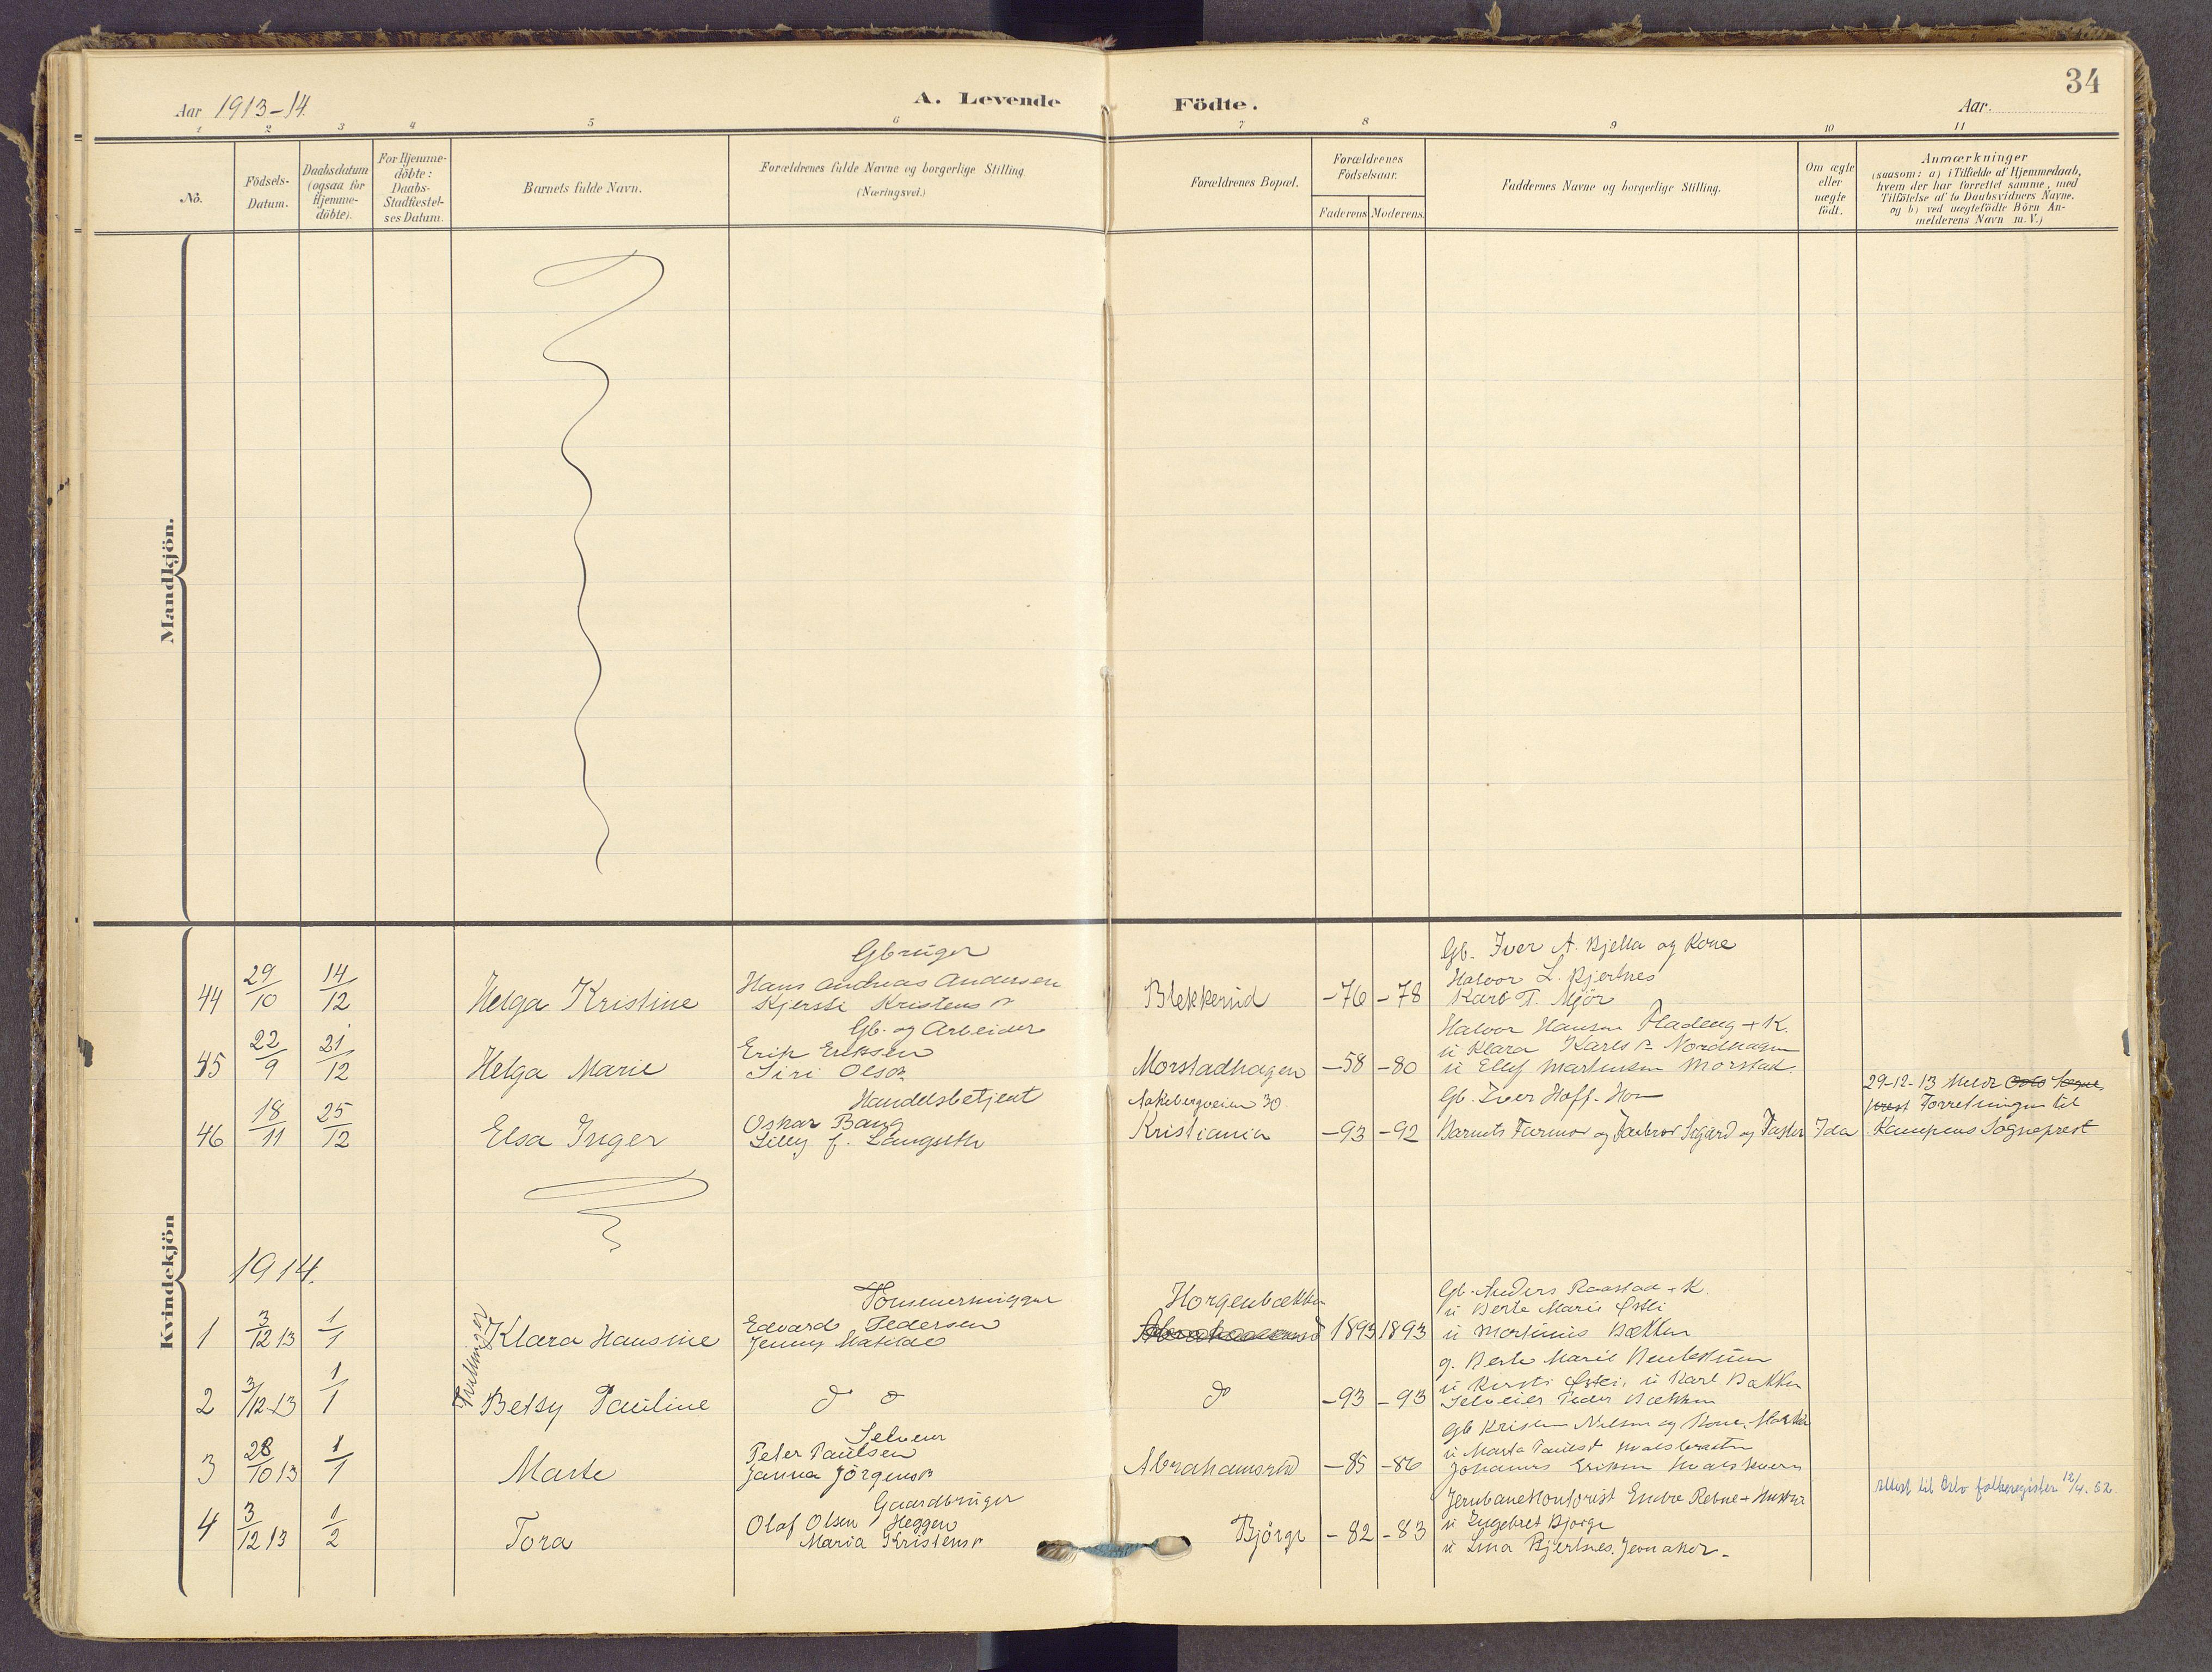 SAH, Gran prestekontor, Ministerialbok nr. 21, 1908-1932, s. 34